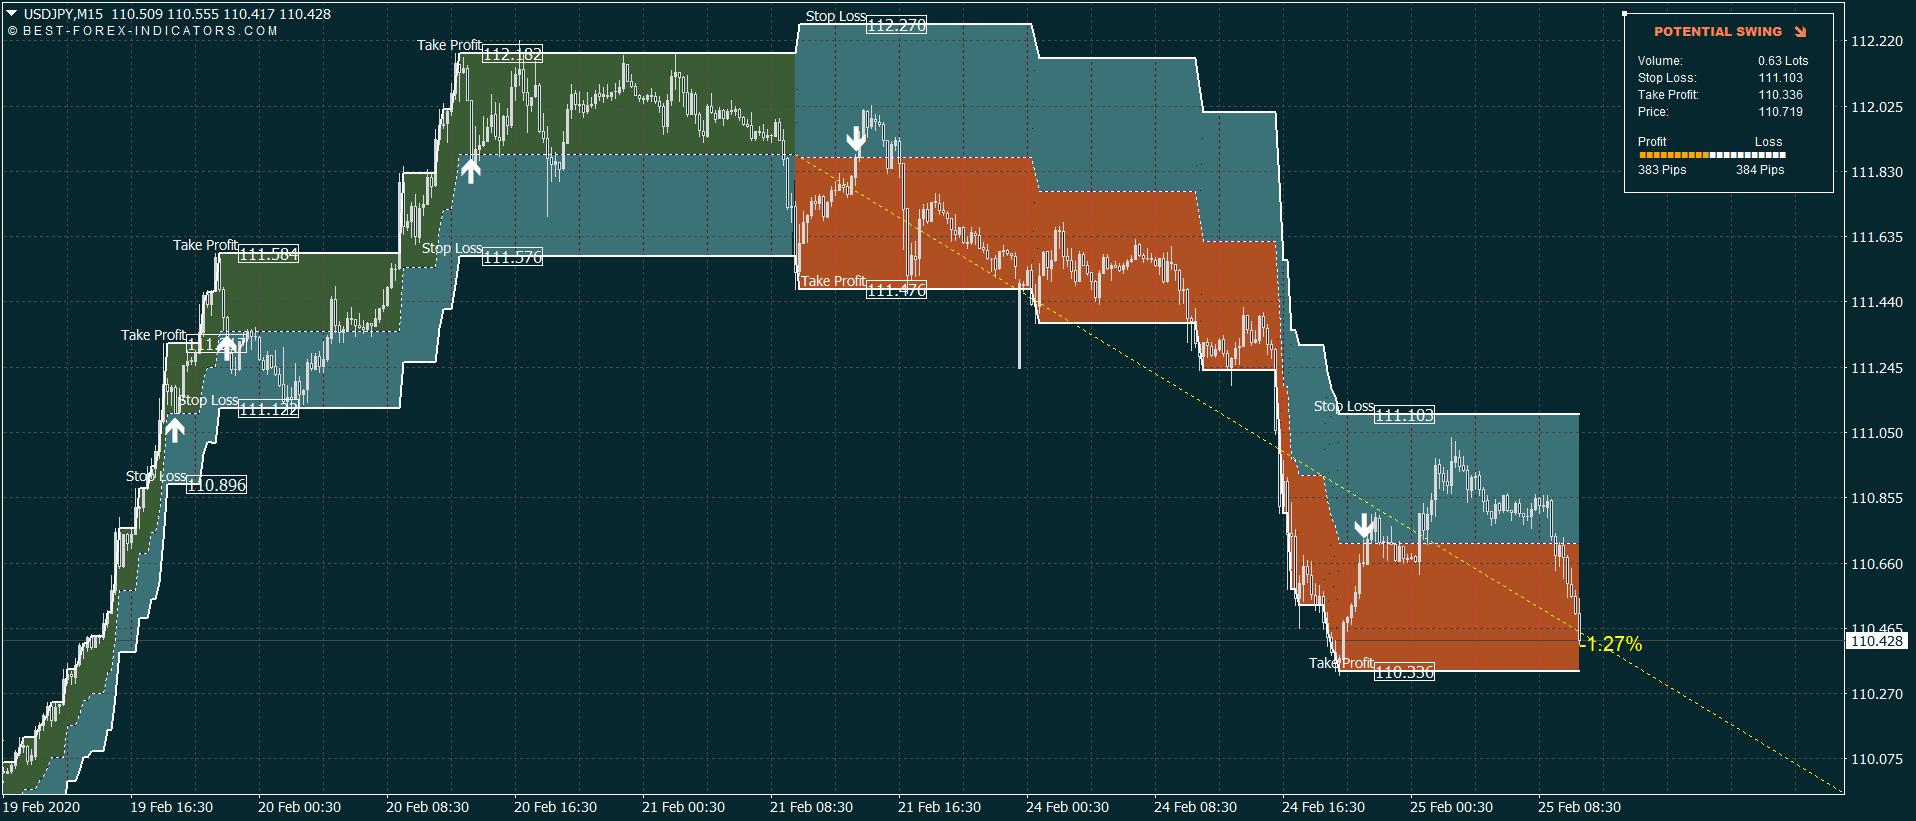 Swing Trading System M15